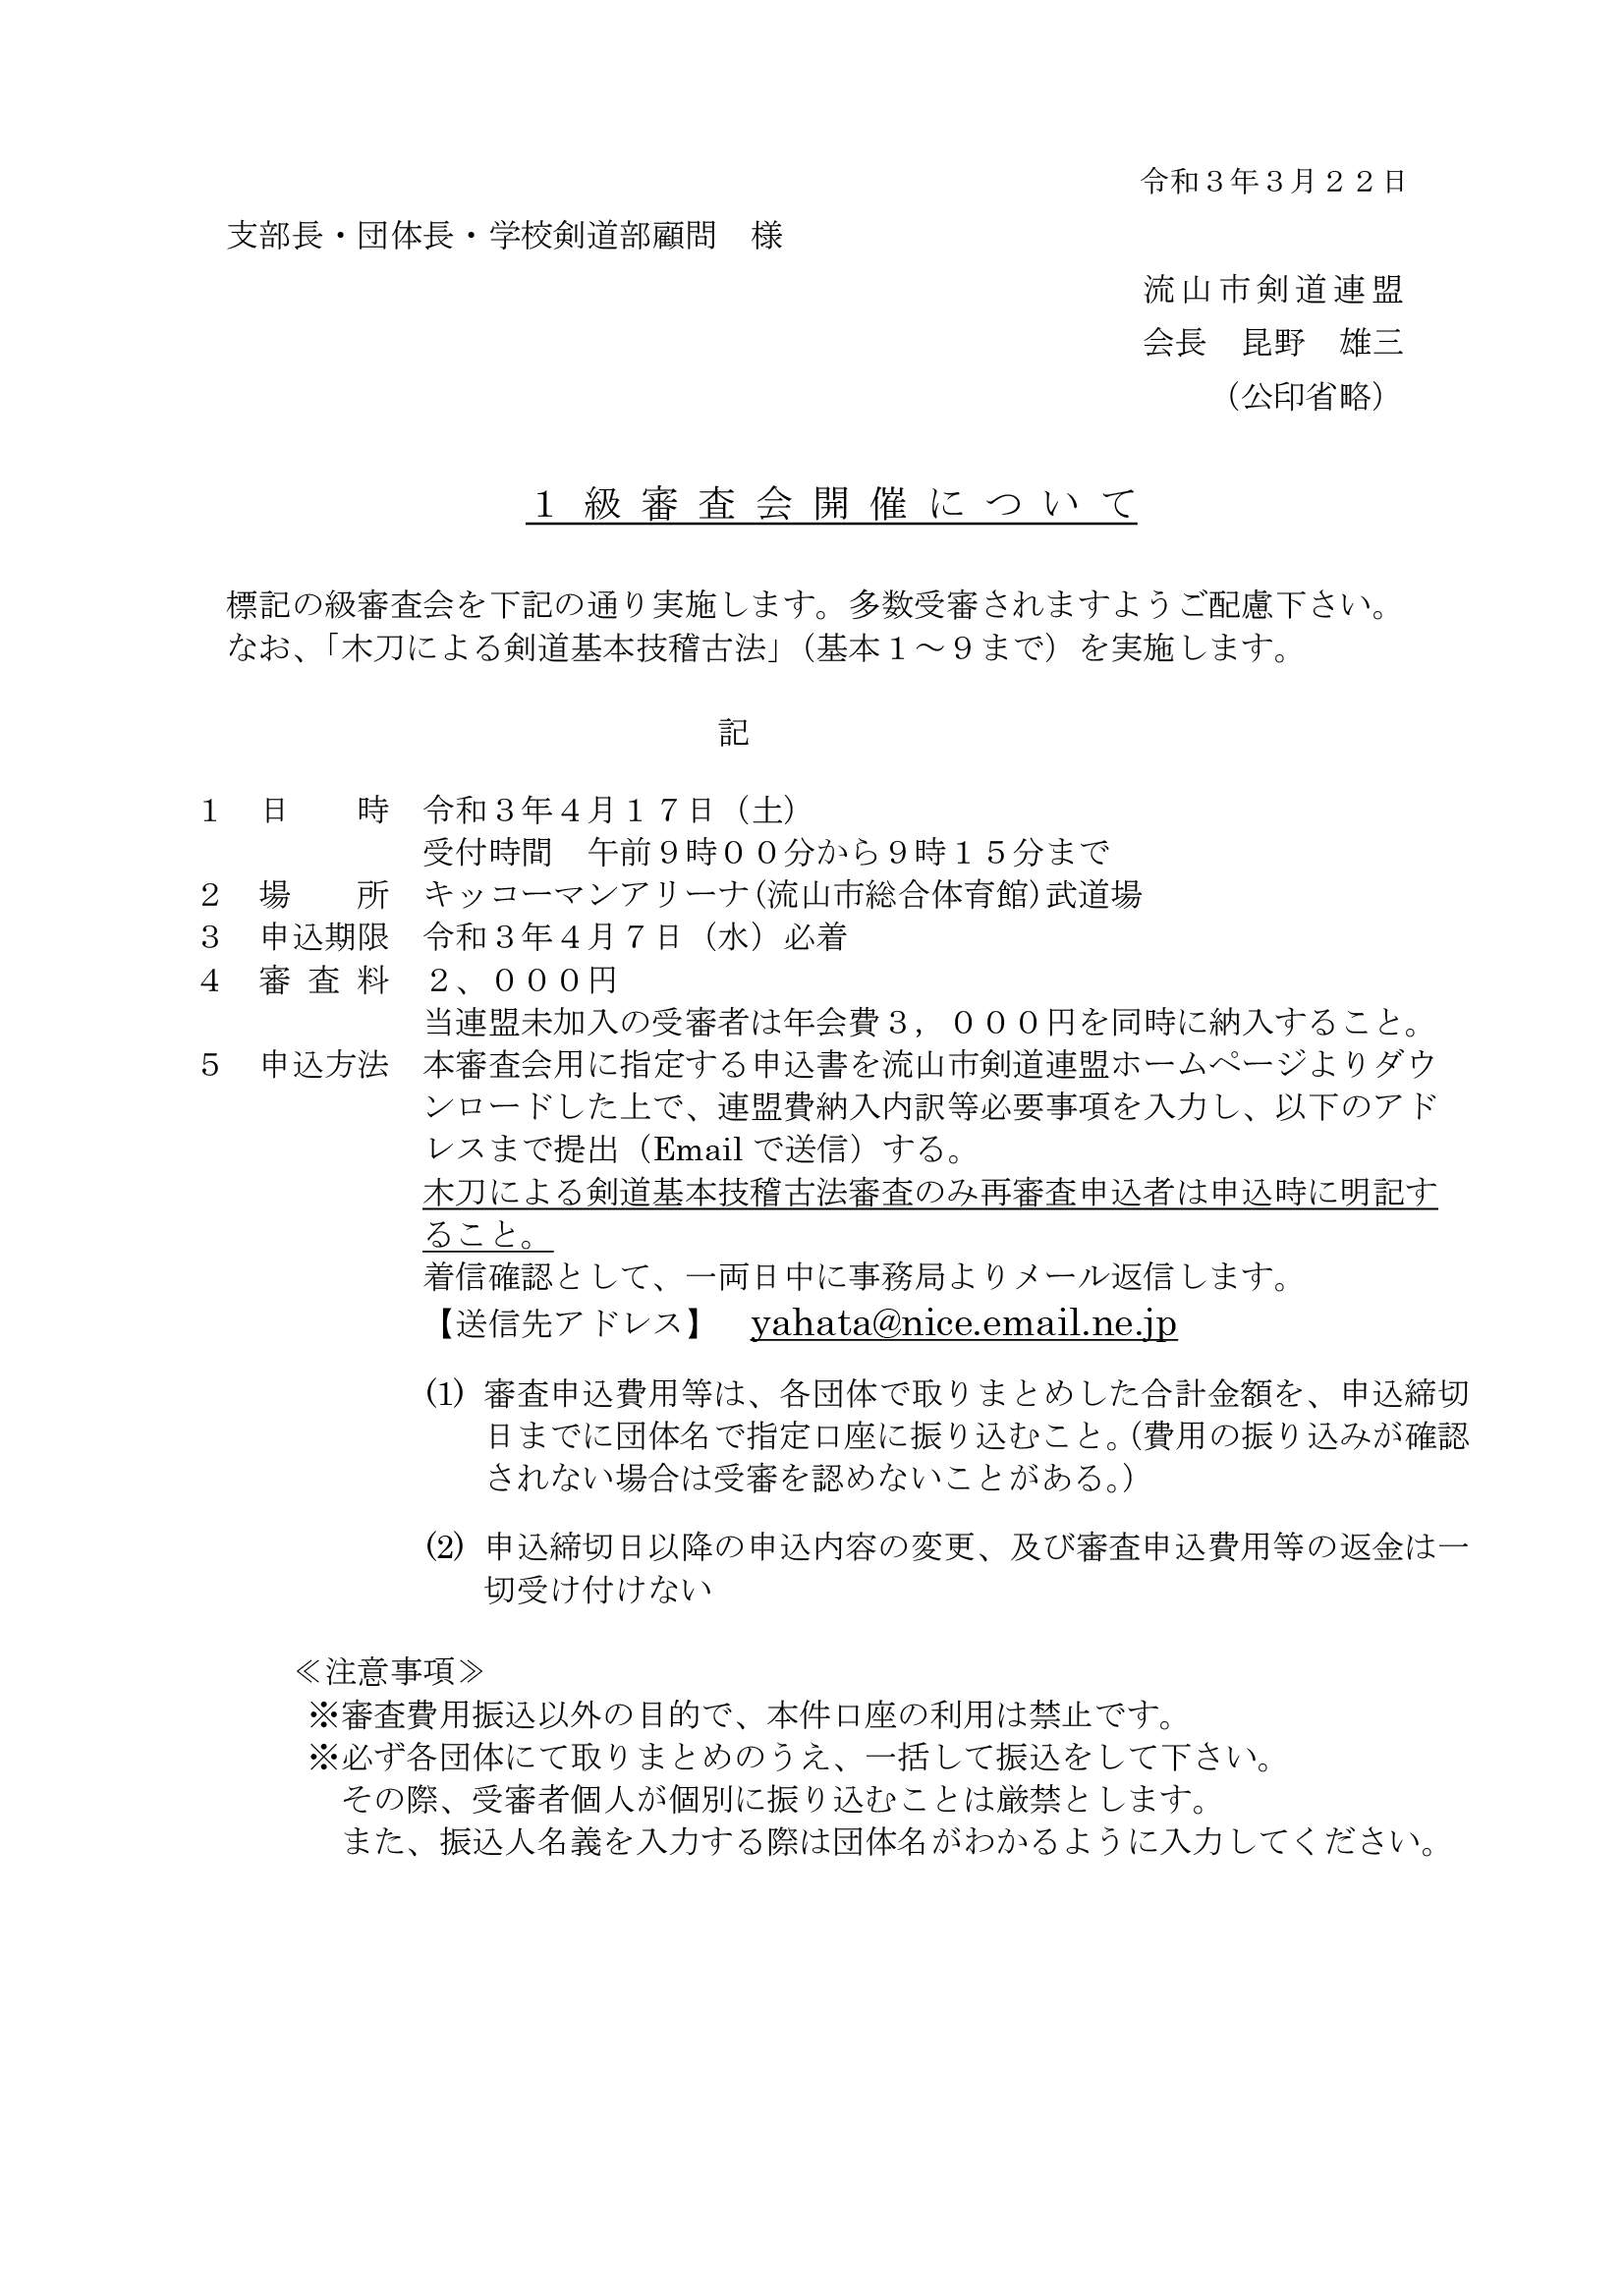 HP用1級審査会案内R3-4_0001